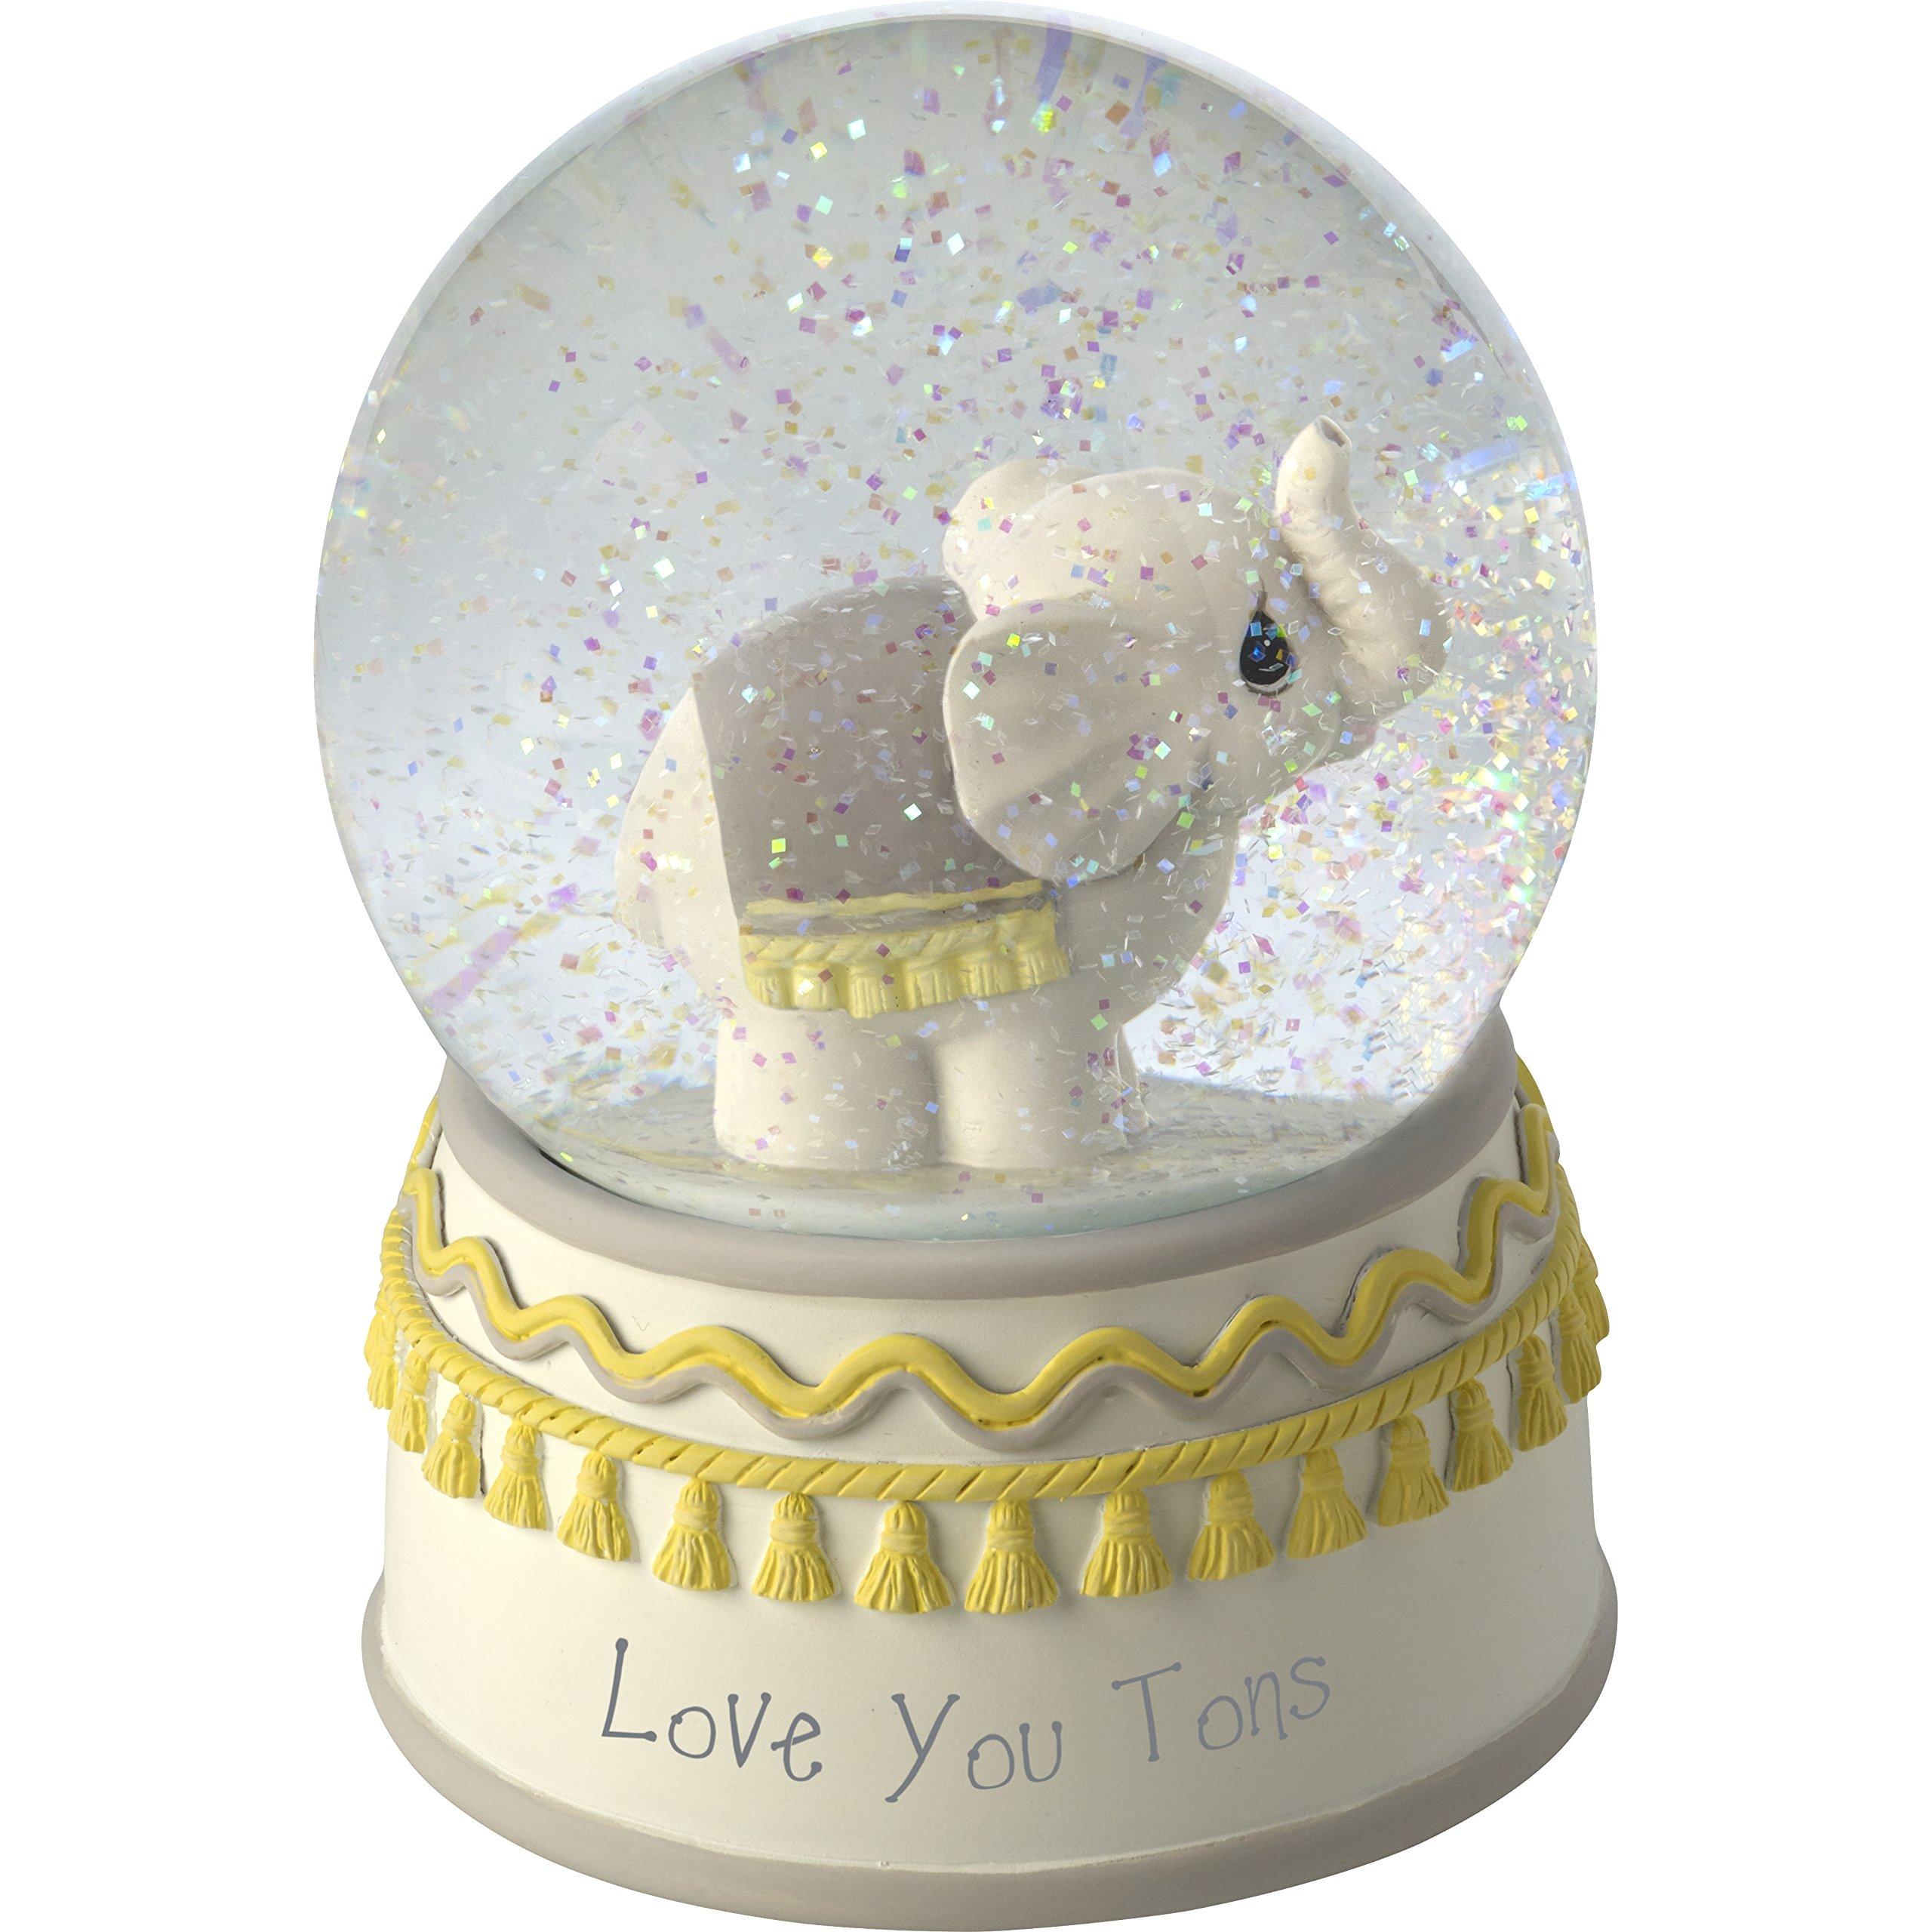 Precious Moments Love You Tons Resin/Glass Elephant Musical Snow Globe, Gray Chevron